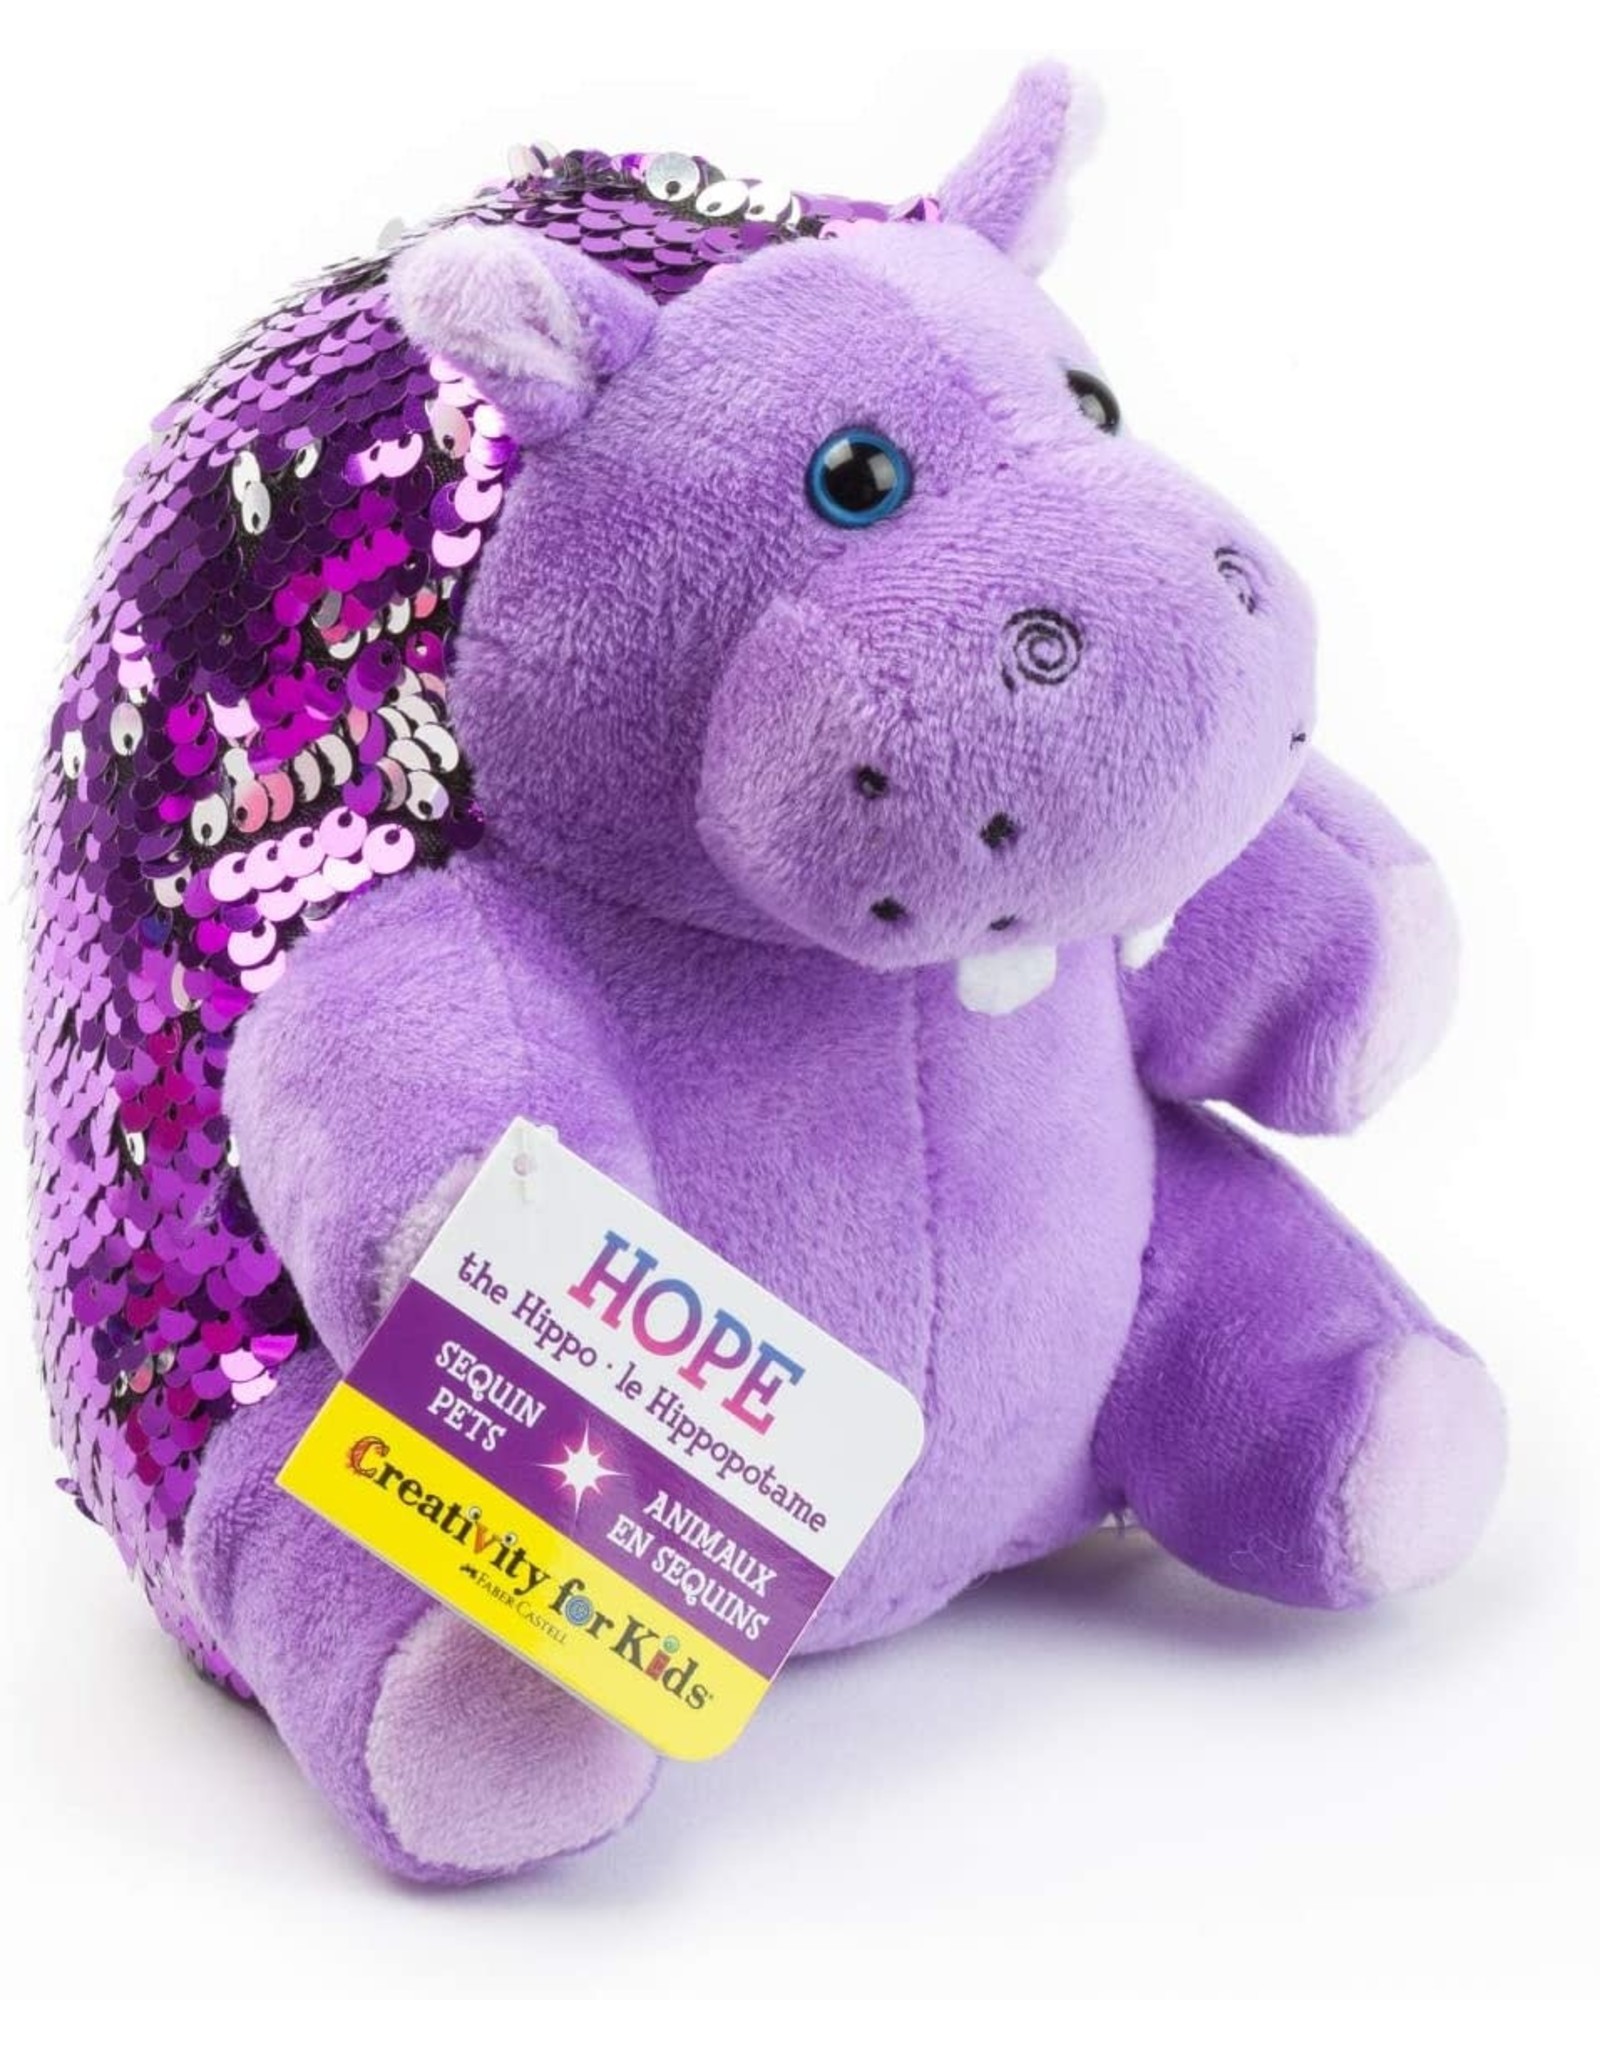 Creativity For Kids Mini Sequin Pets: Hope the Hippopotamus